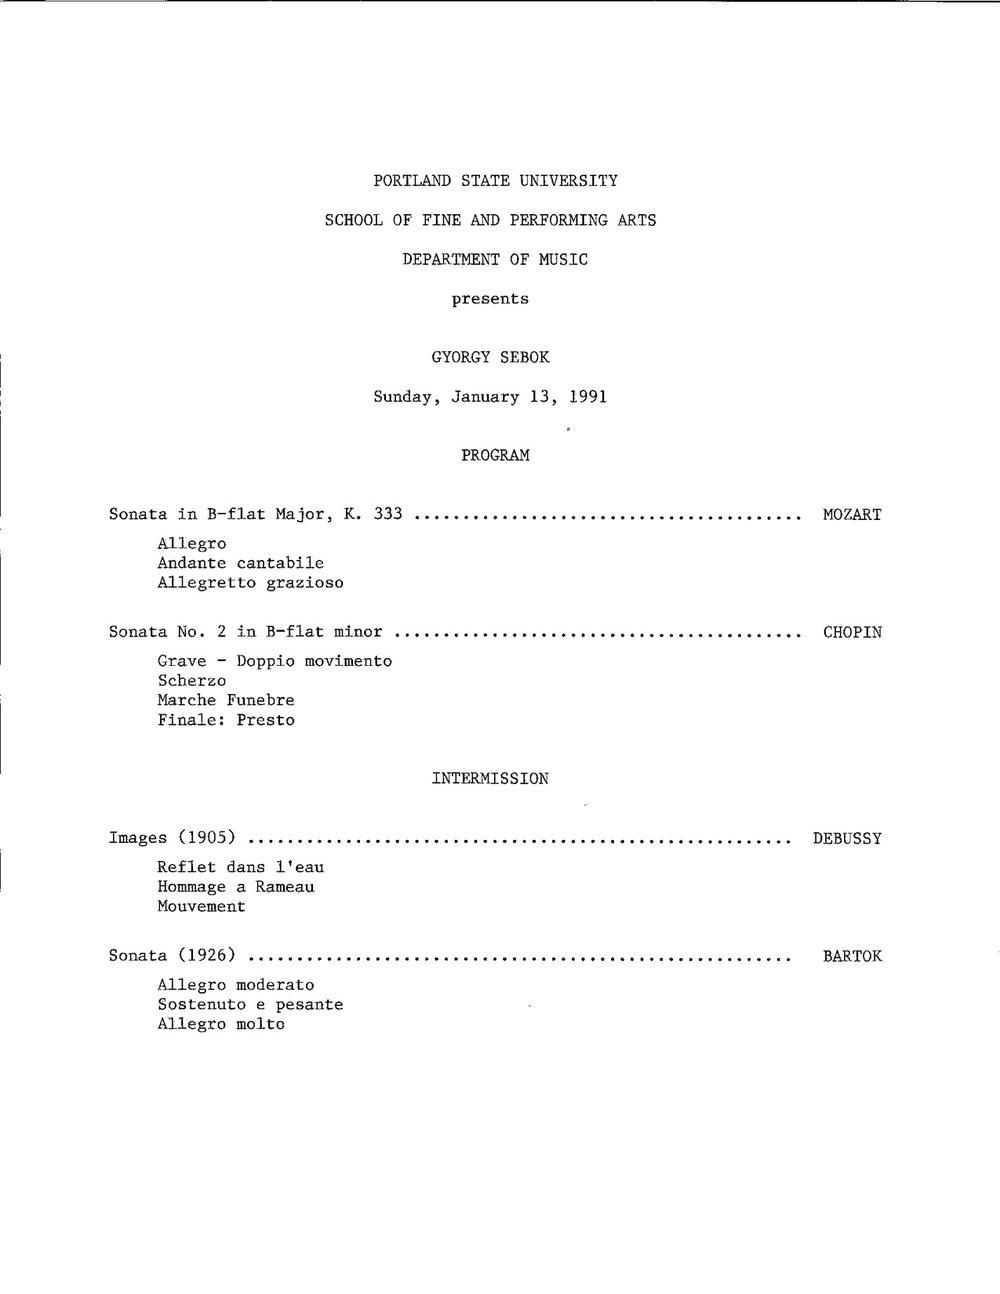 Sebok90-91_Program1.jpg